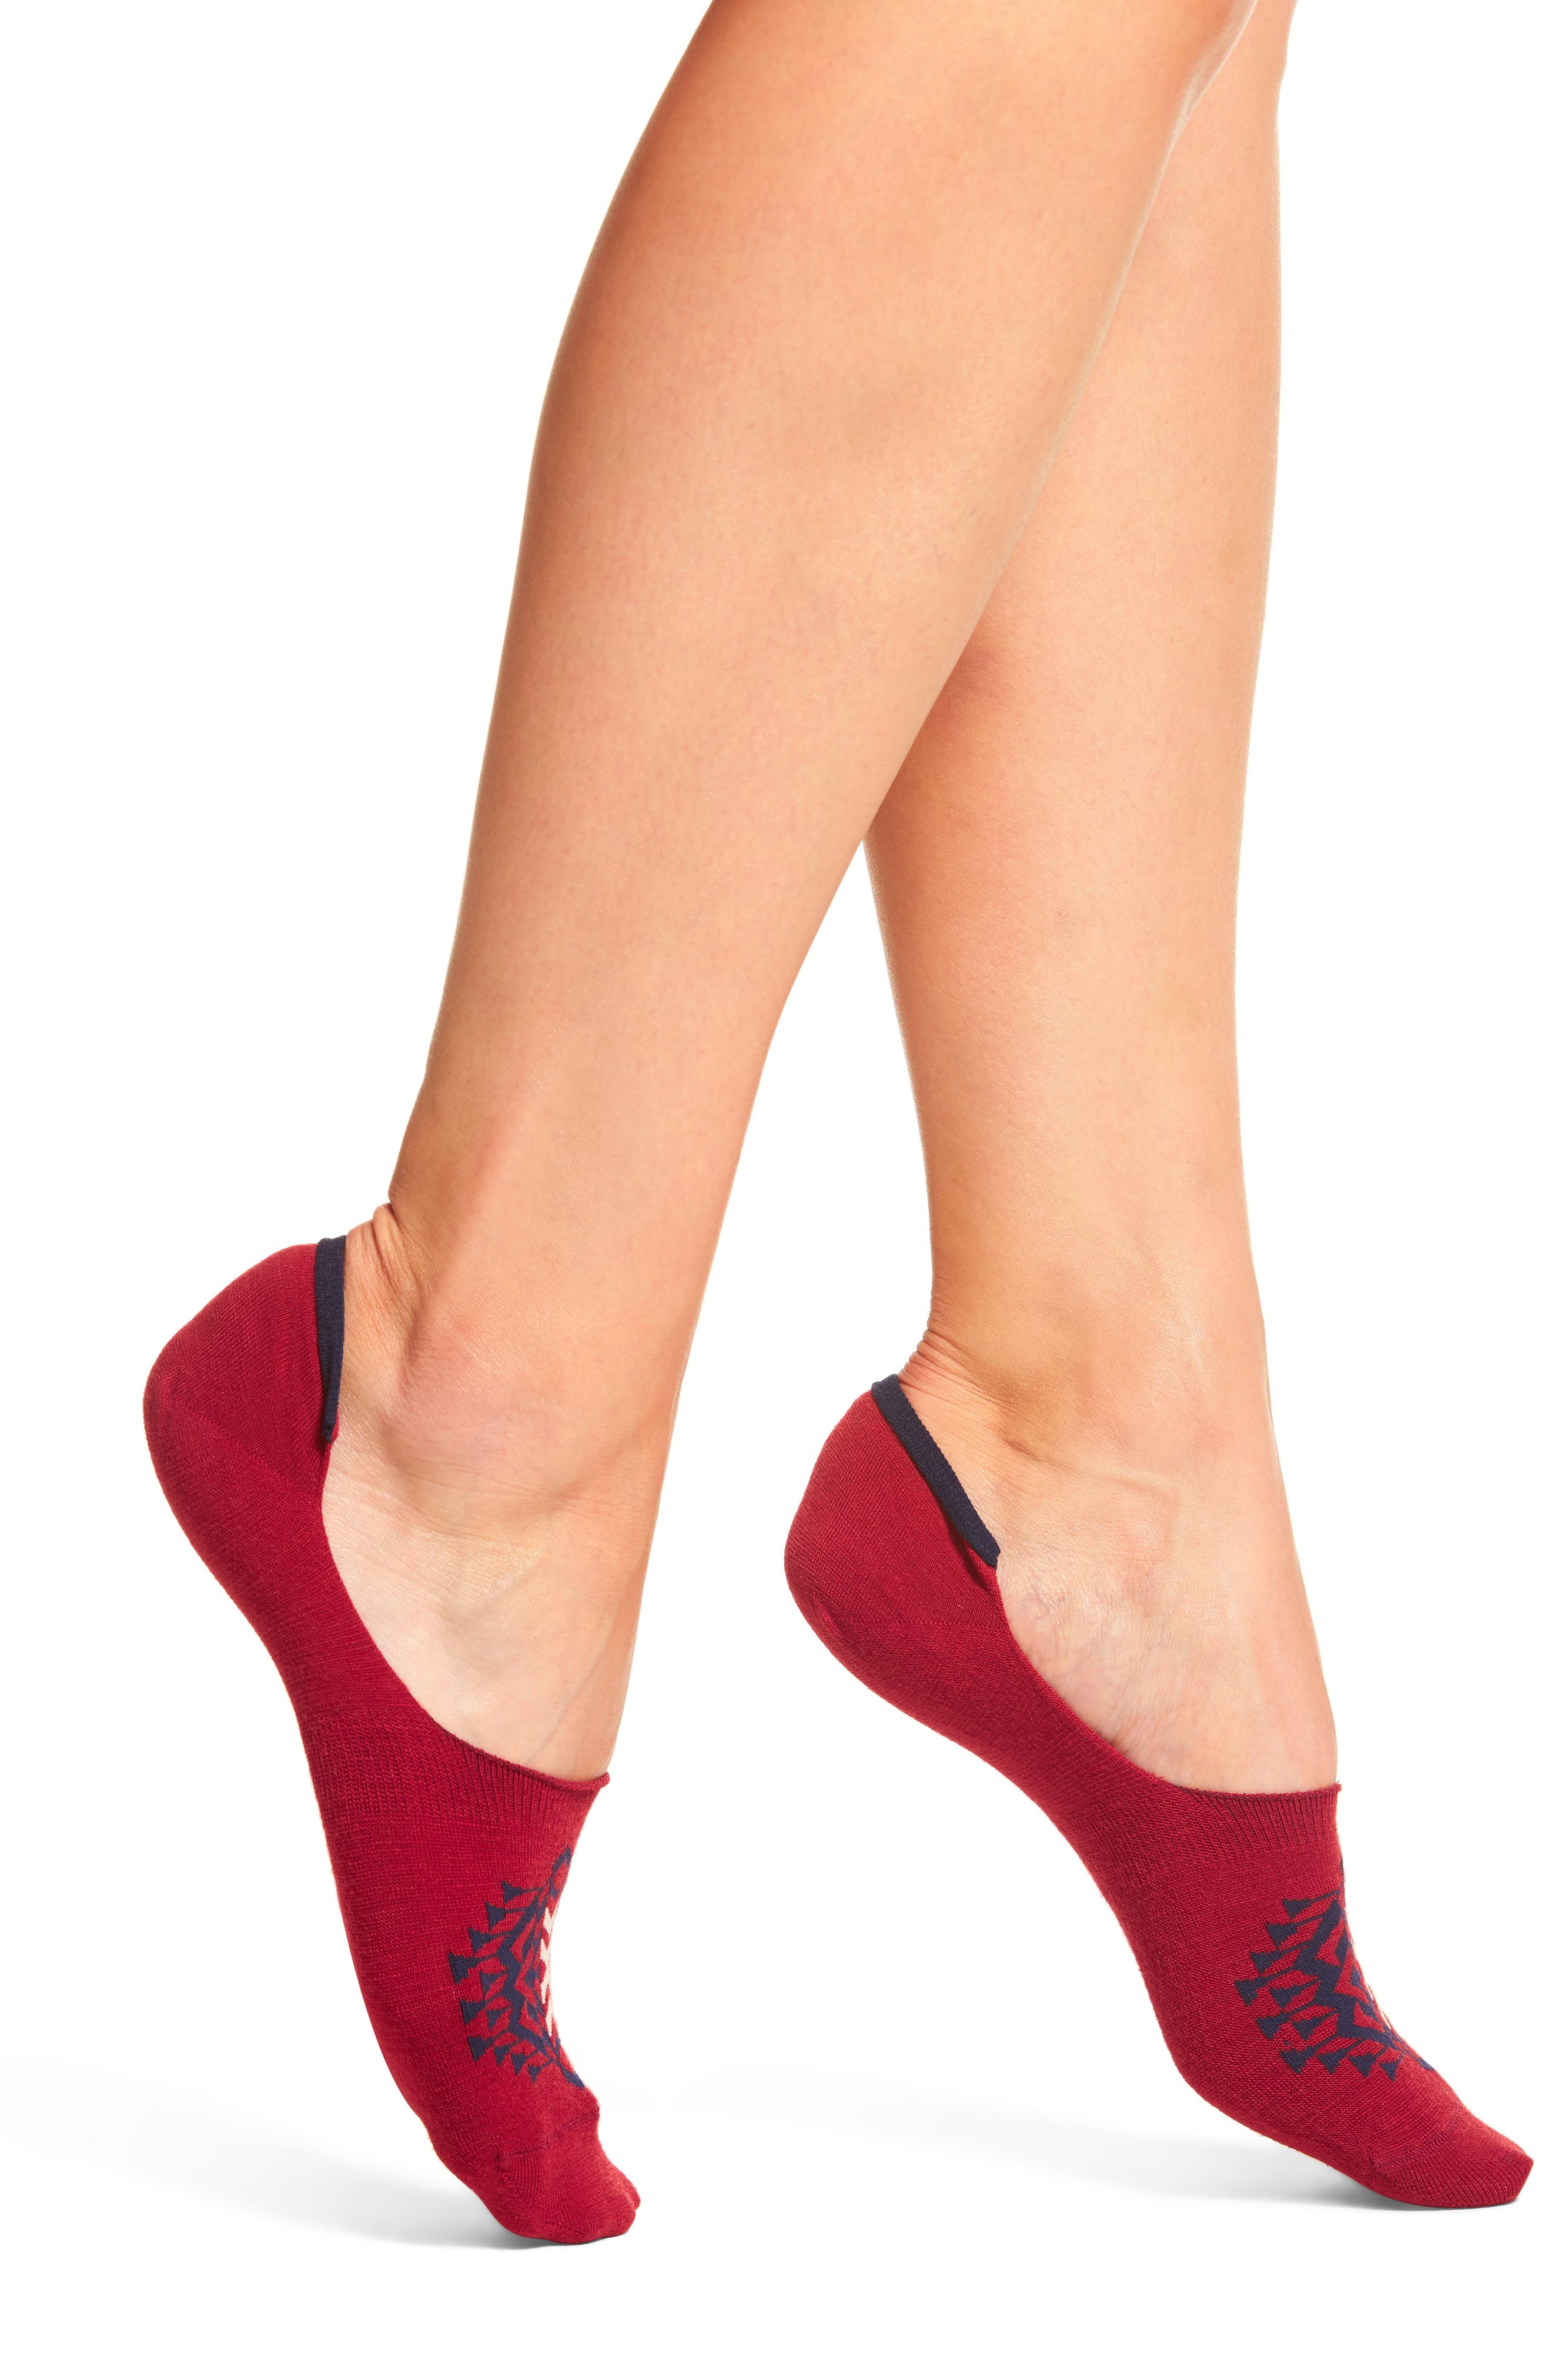 Tolovana No-Show Socks,                             Main thumbnail 1, color,                             600